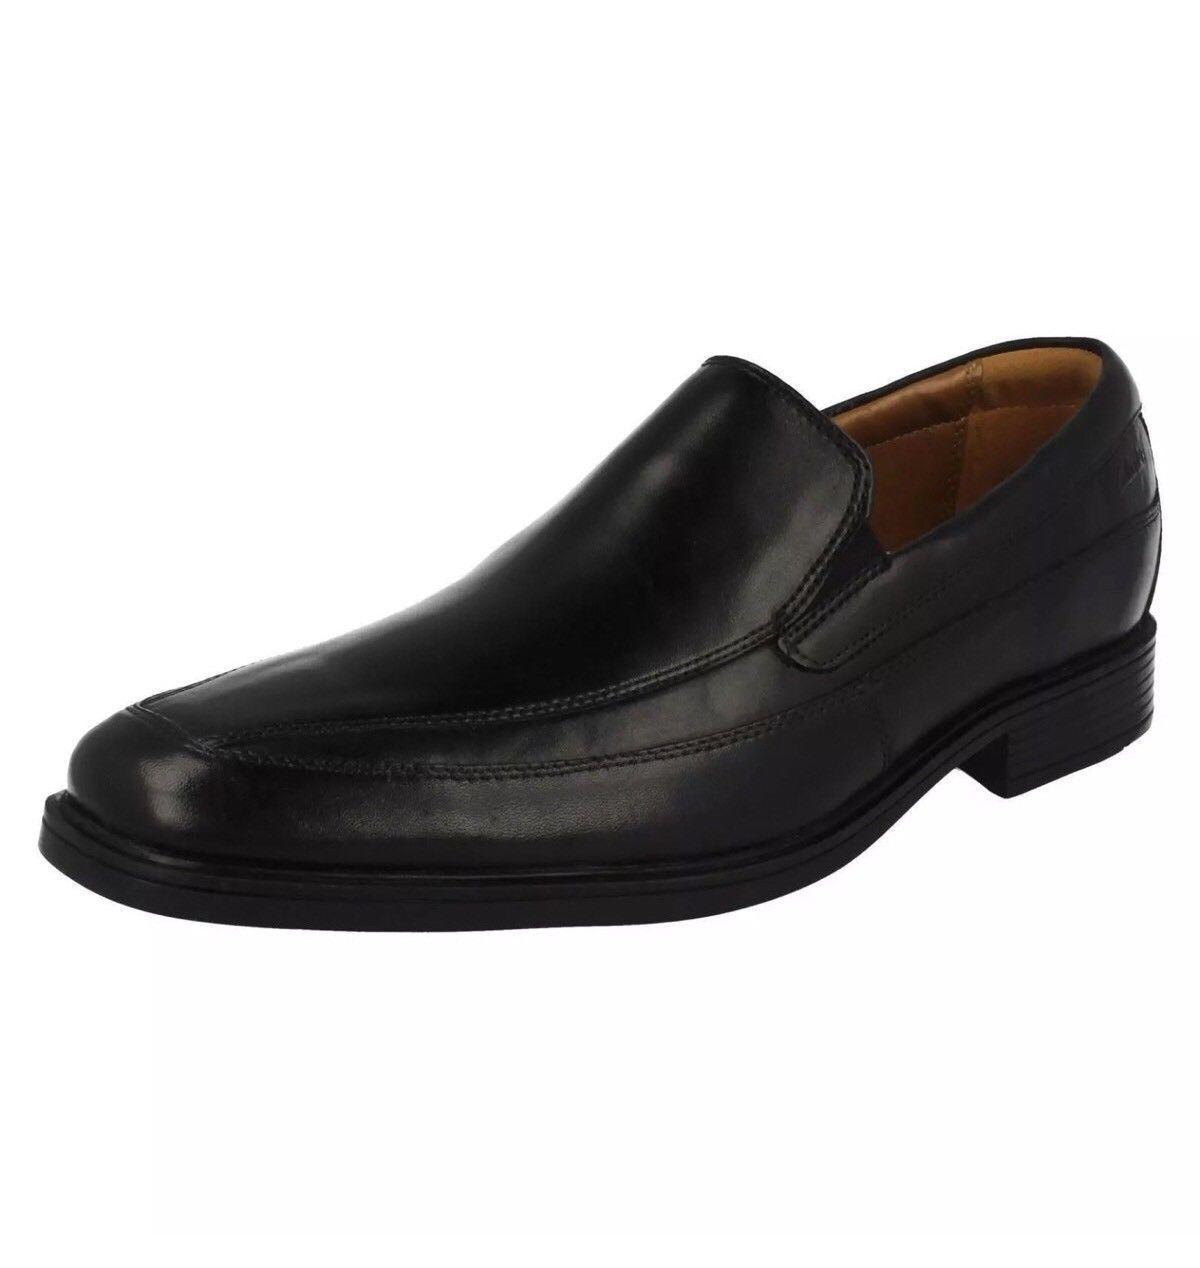 Clarks Tilden Free Men's Shoes Black Leather Slip On Shoes Men's G-Fit (R28A)(Kett) 5a005b